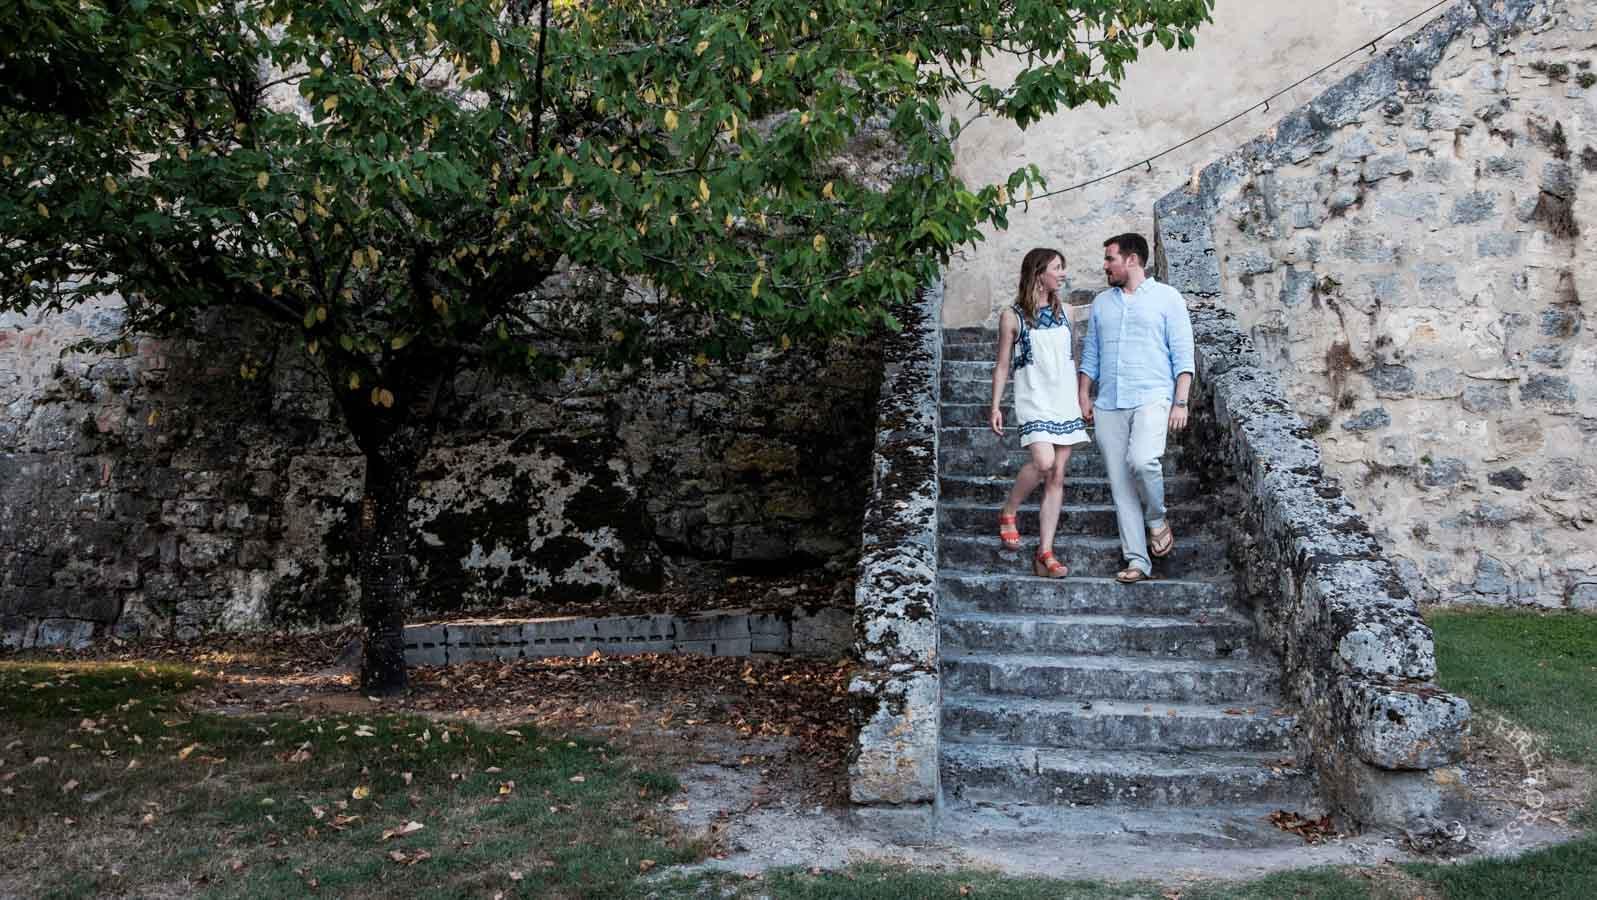 Lot-et-Garonne-Wedding-Photography-047